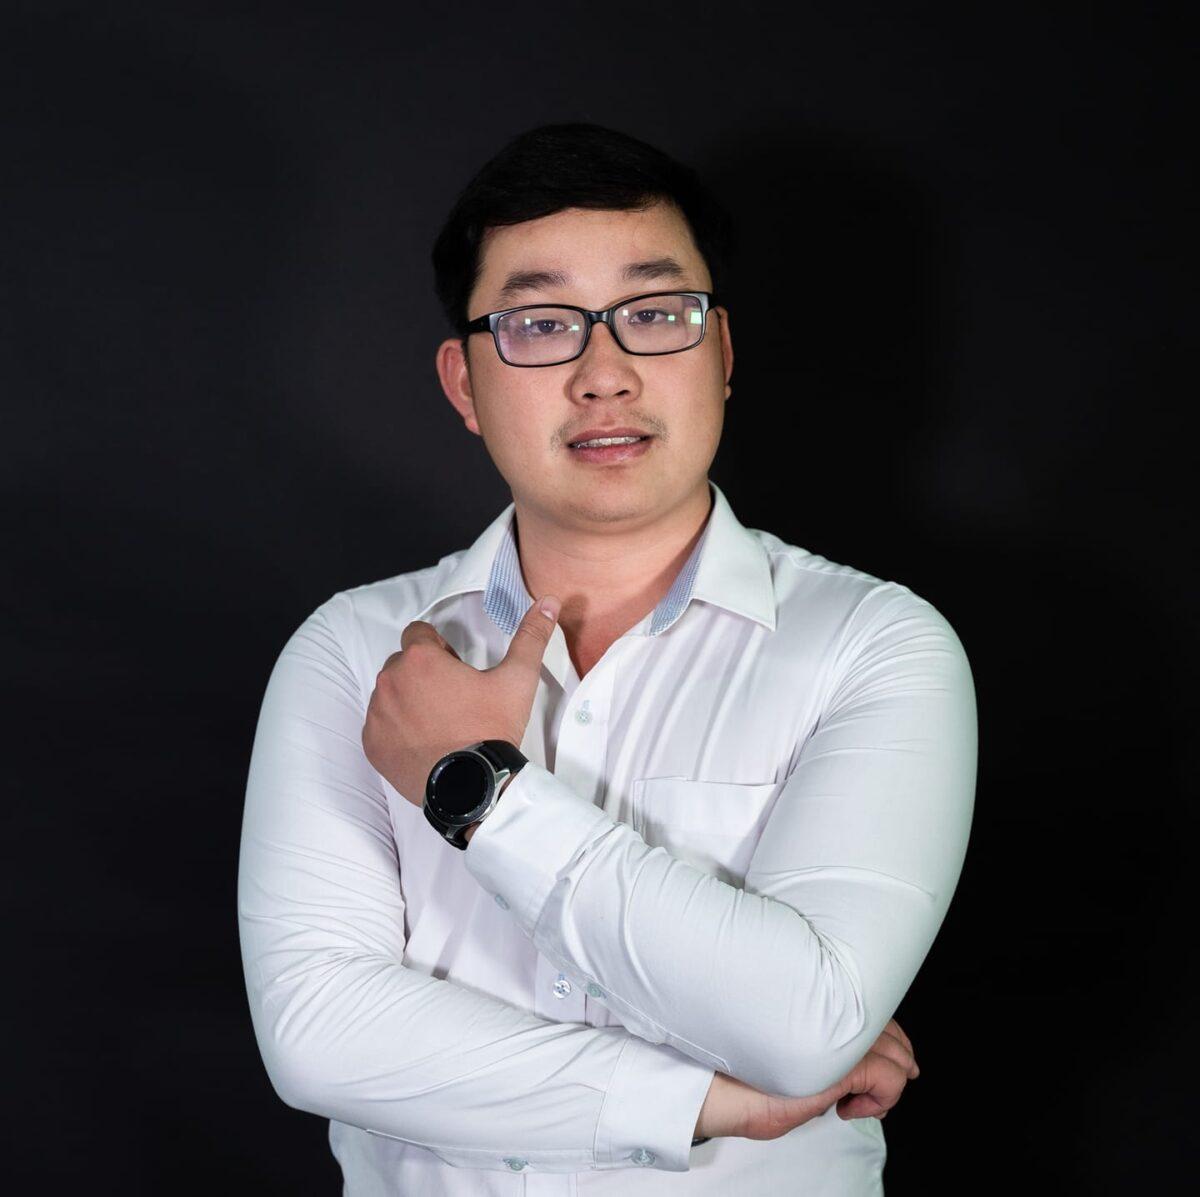 Nguyen Van Thanh Binh